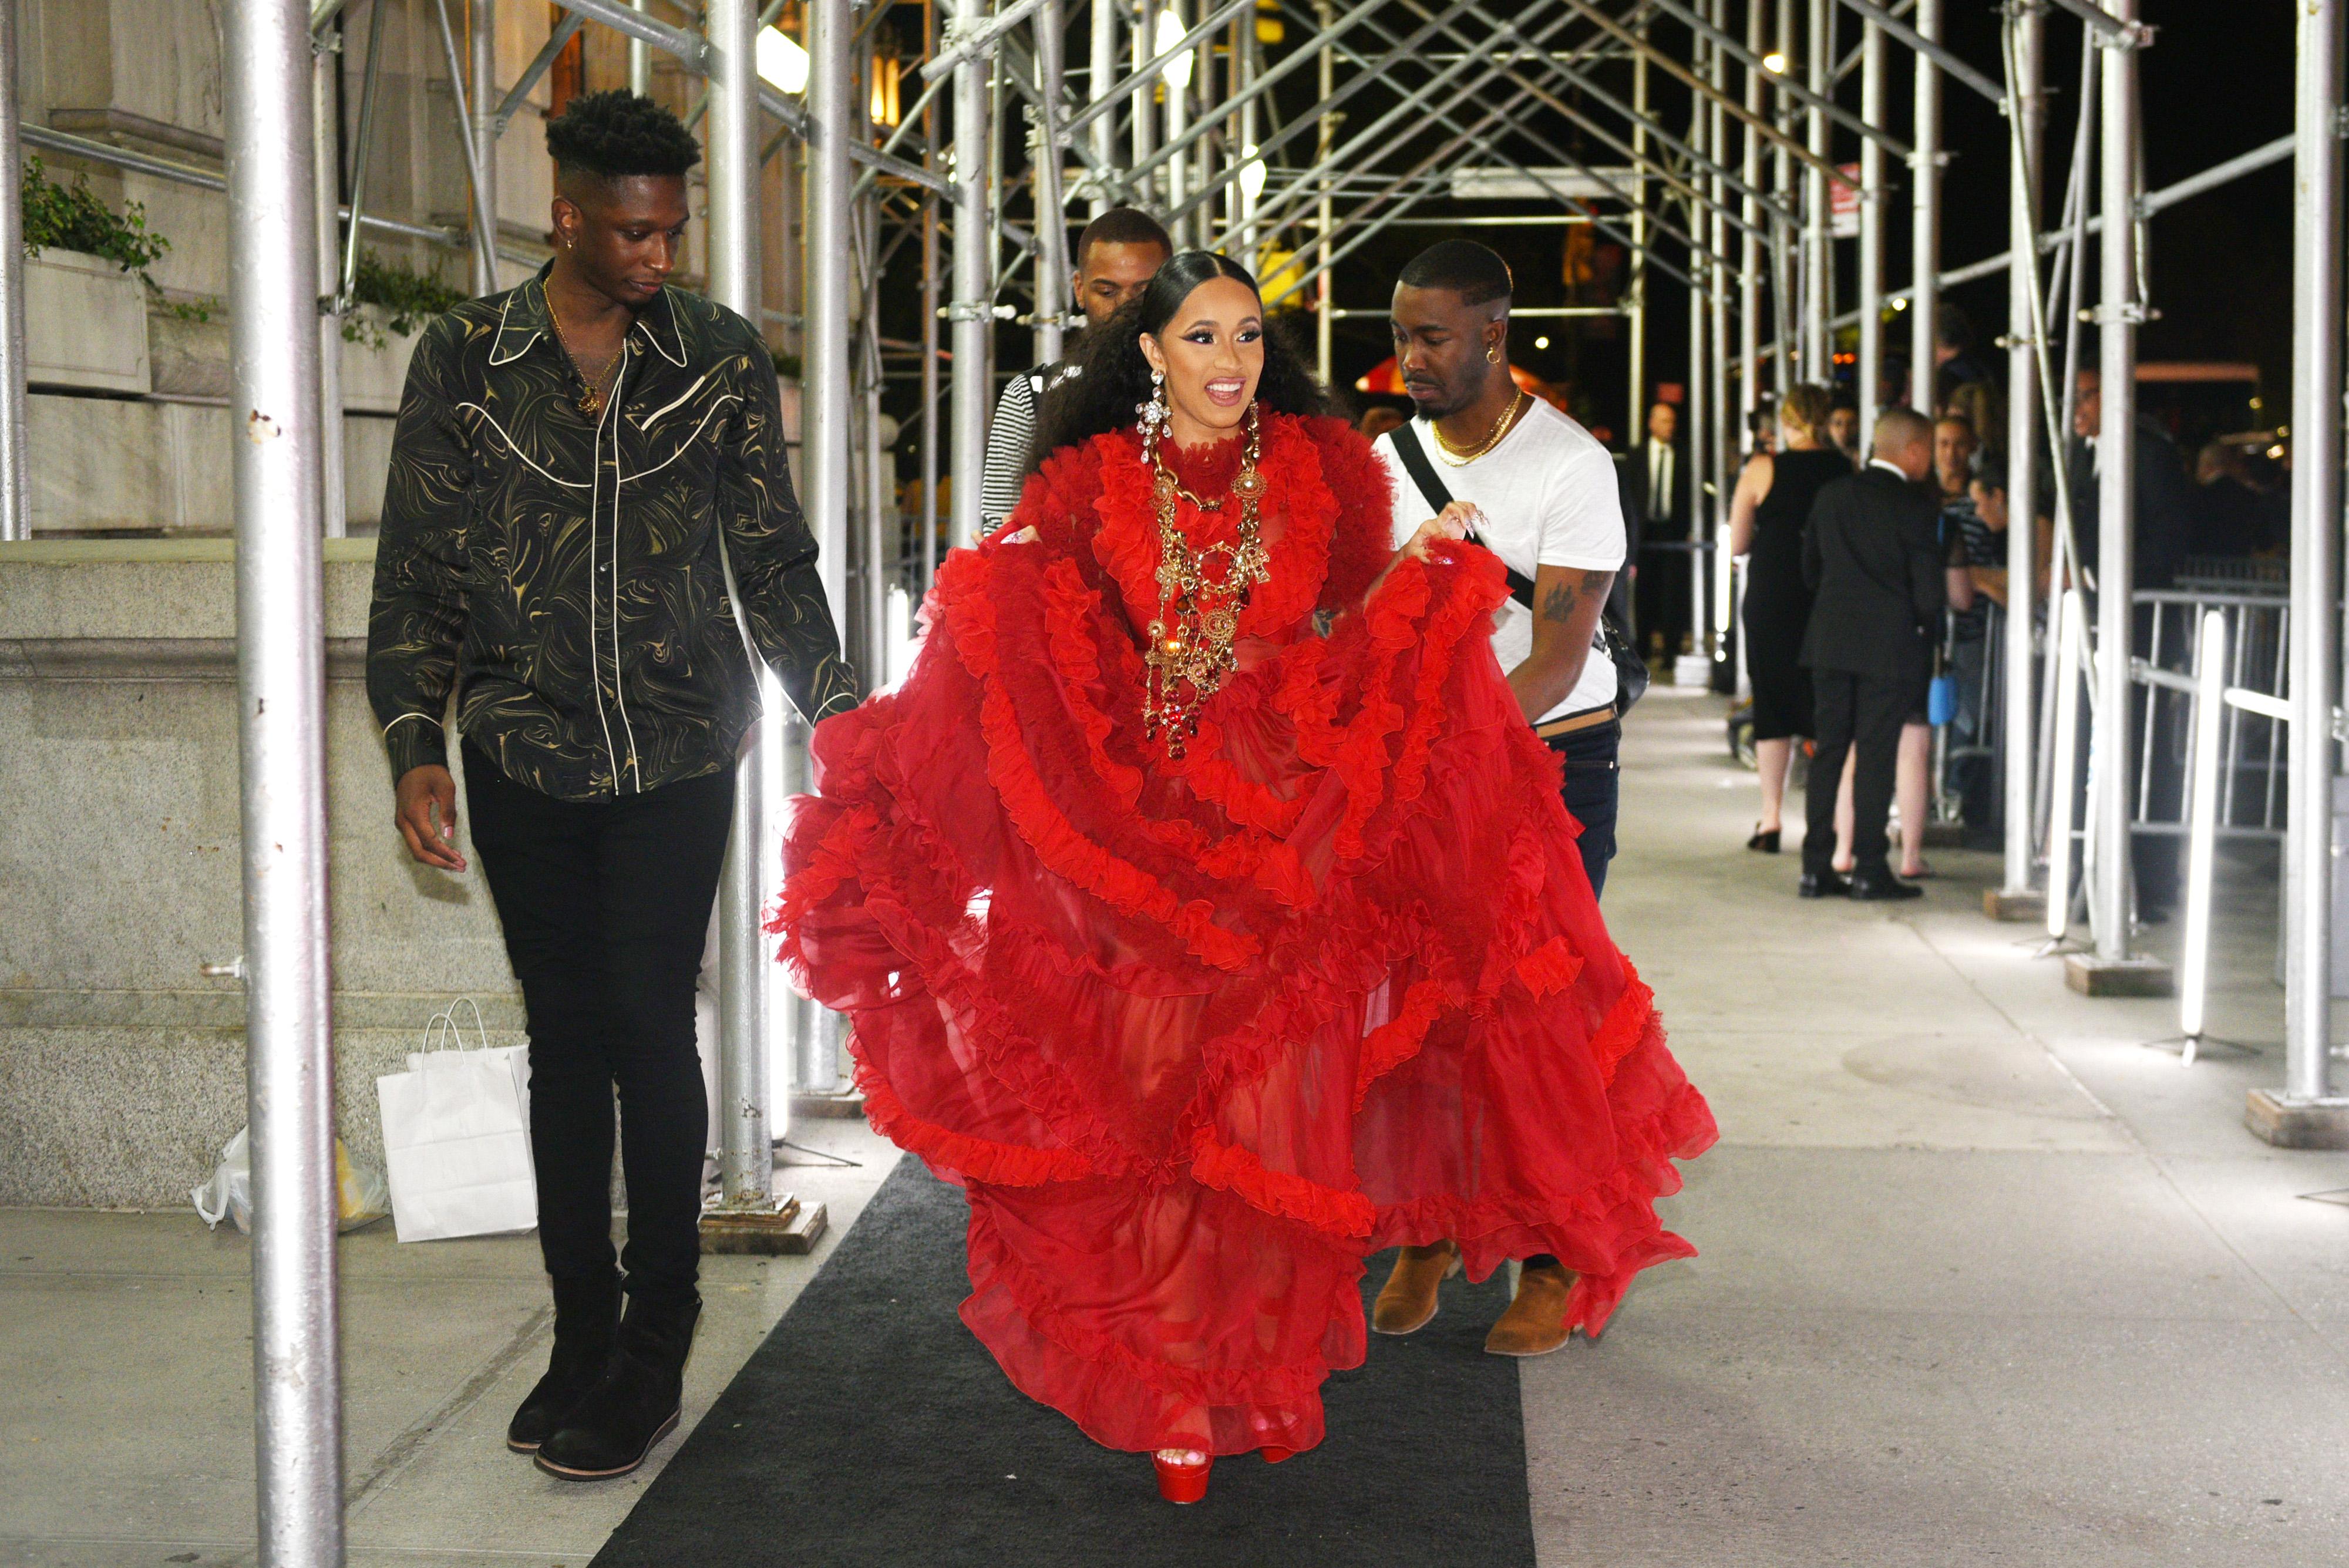 The Nicki Minaj/Cardi B Feud Exploded Into A Full-Out Shoe-Throwing Fashion Week Brawl